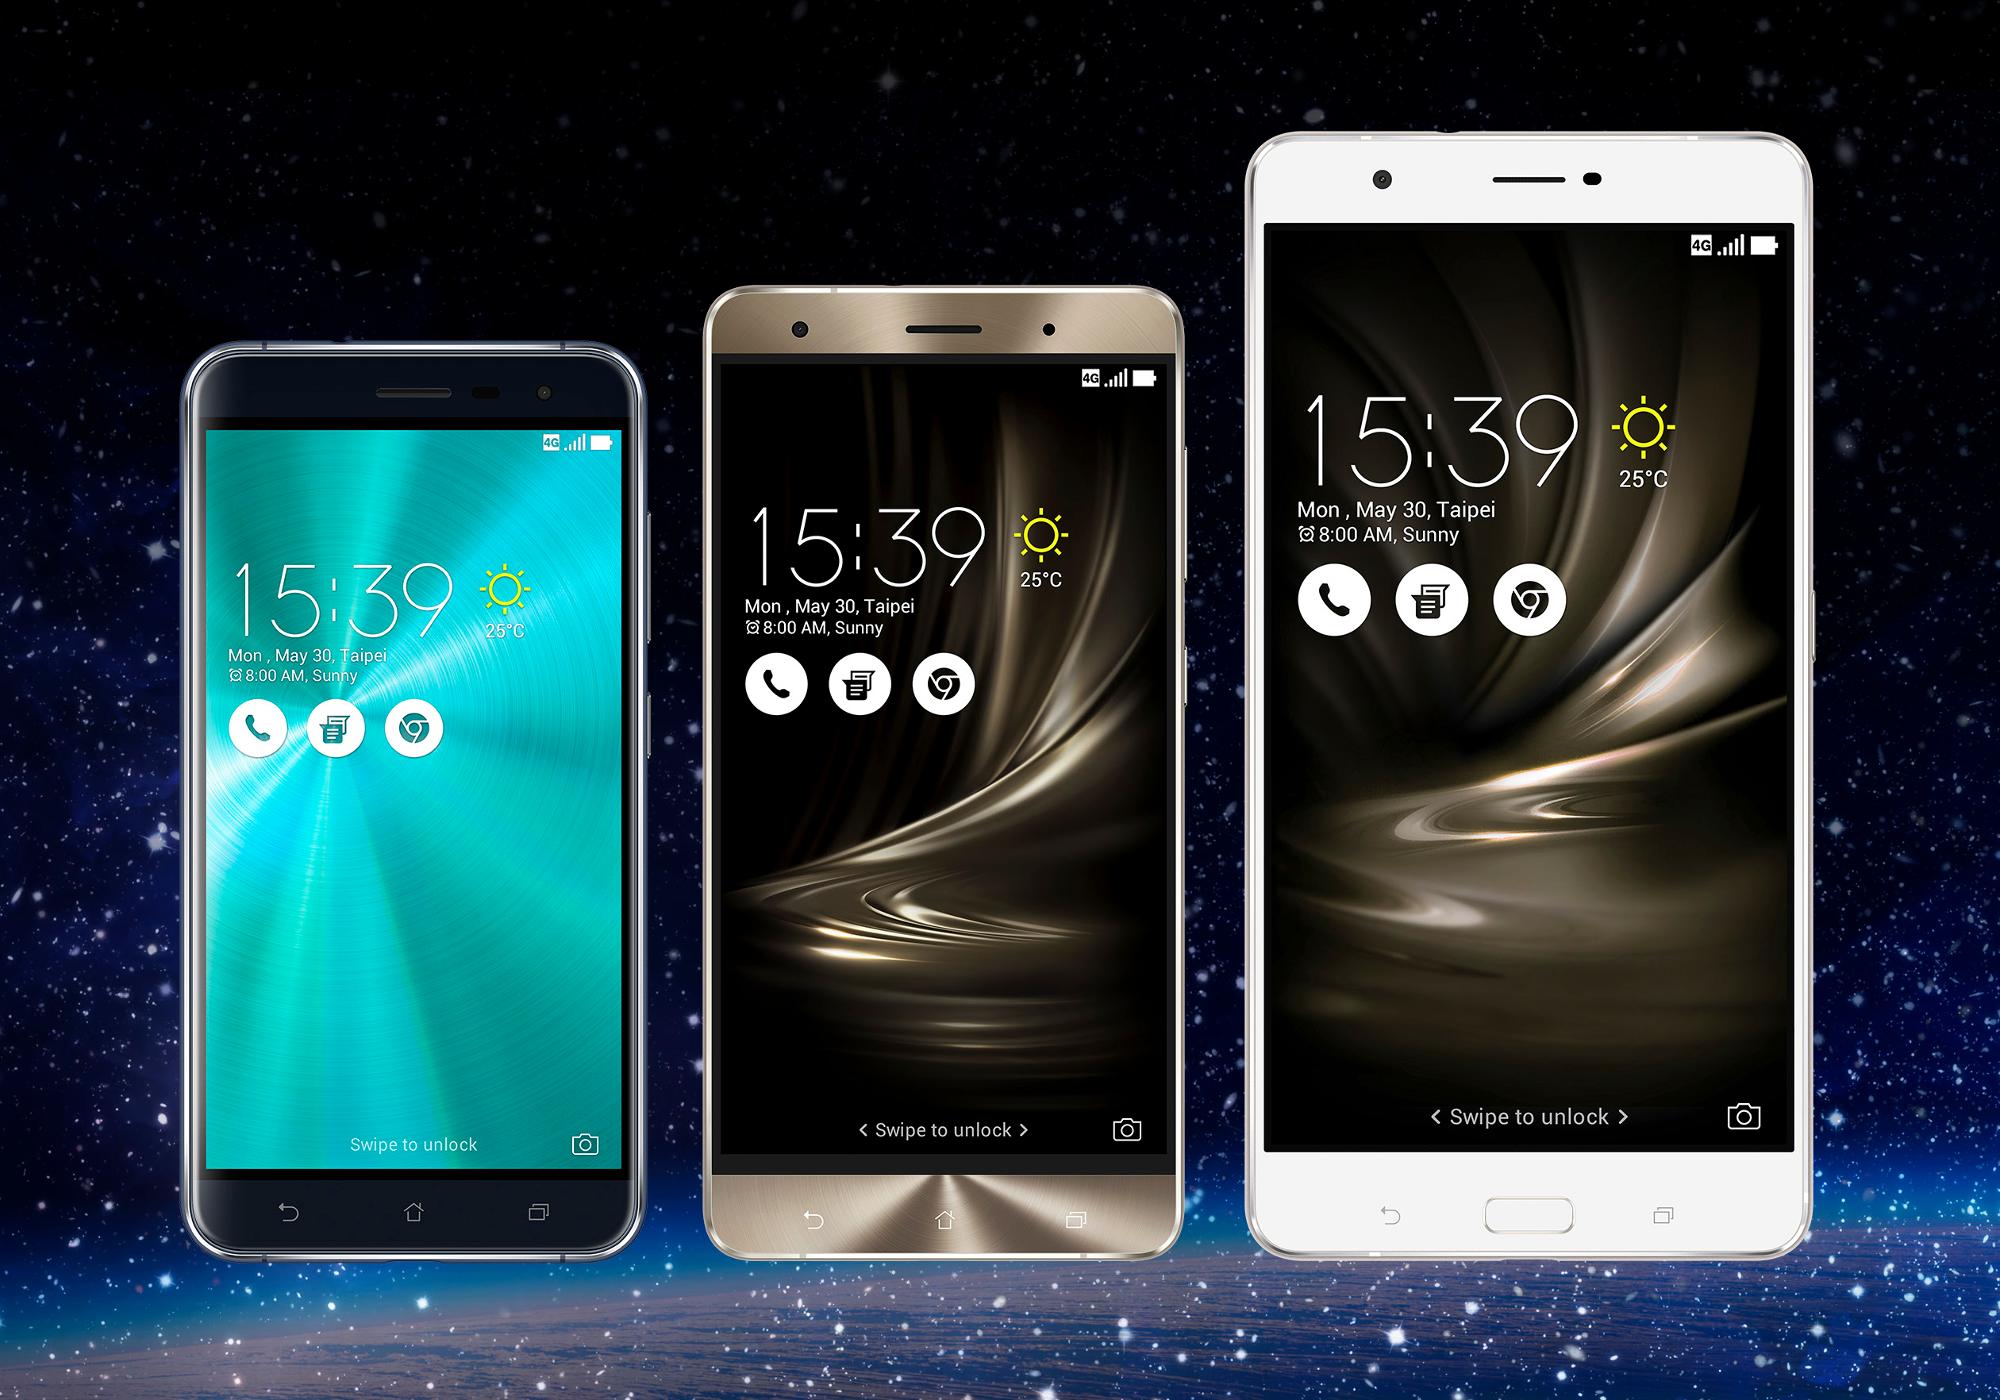 ASUS Announces Zenfone 3 Smartphone Family